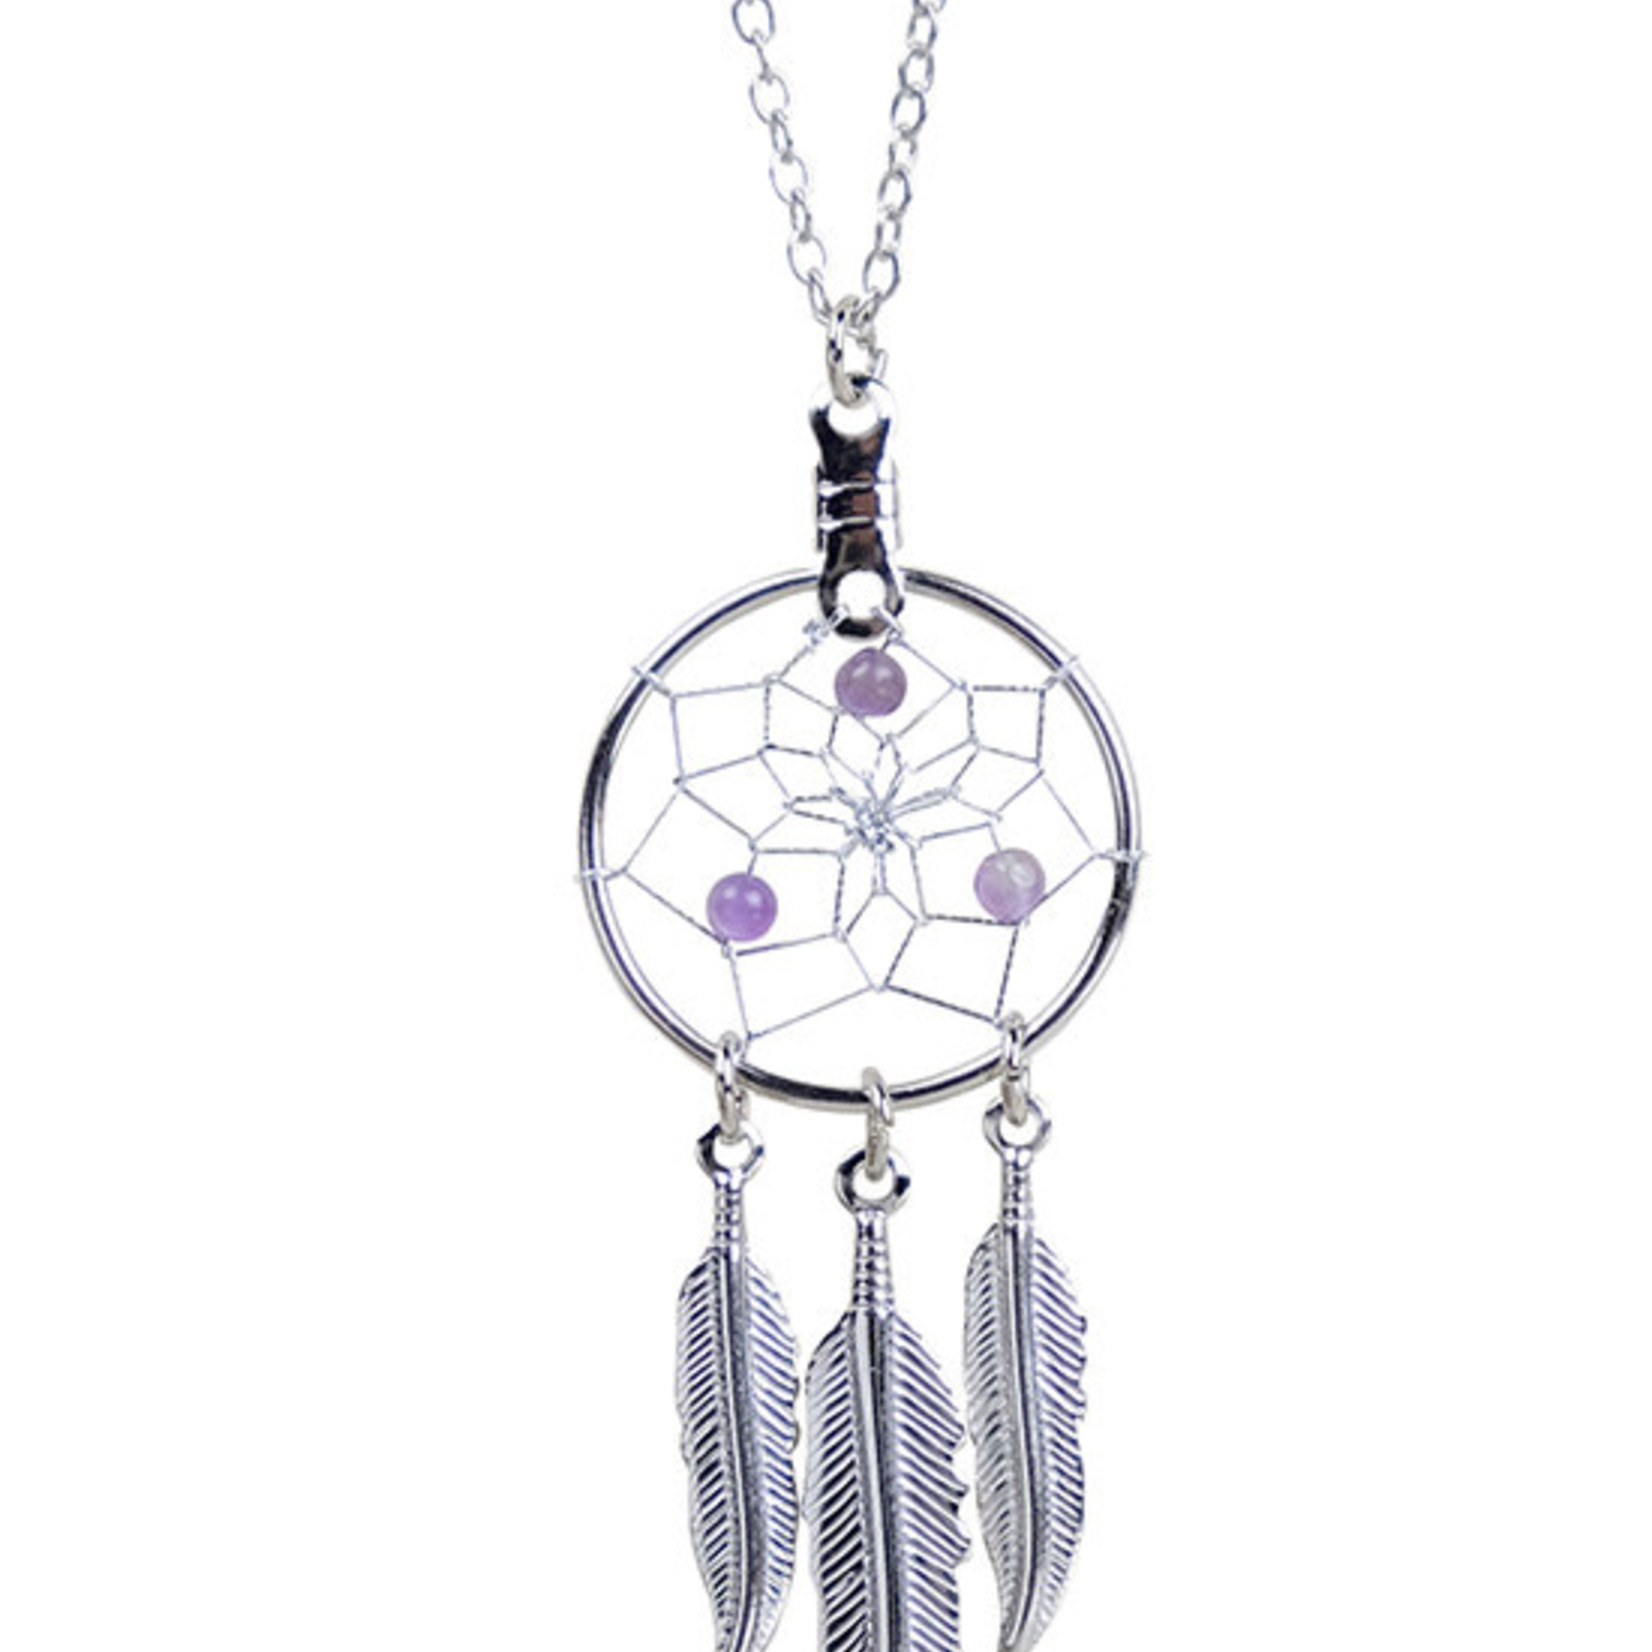 February Dreamcatcher Birthstone Necklace